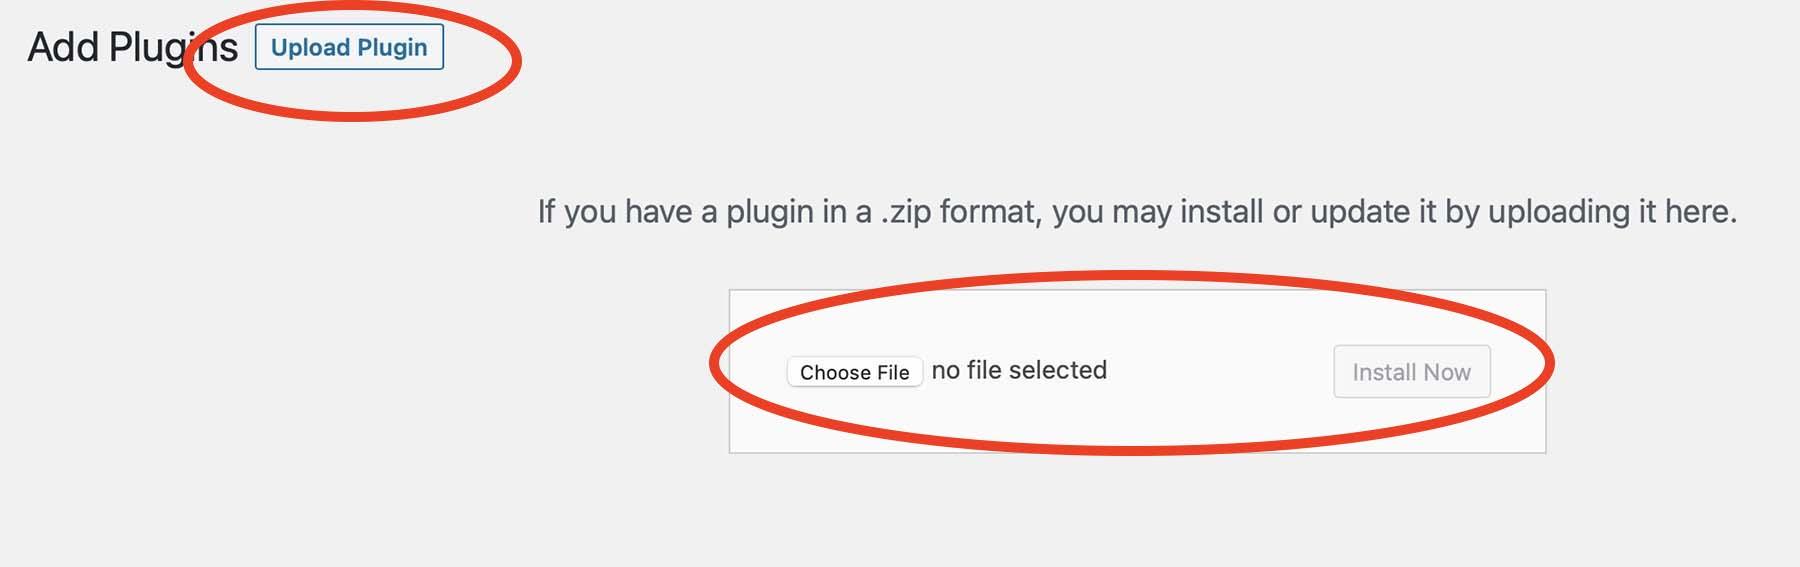 Add Plugins Upload